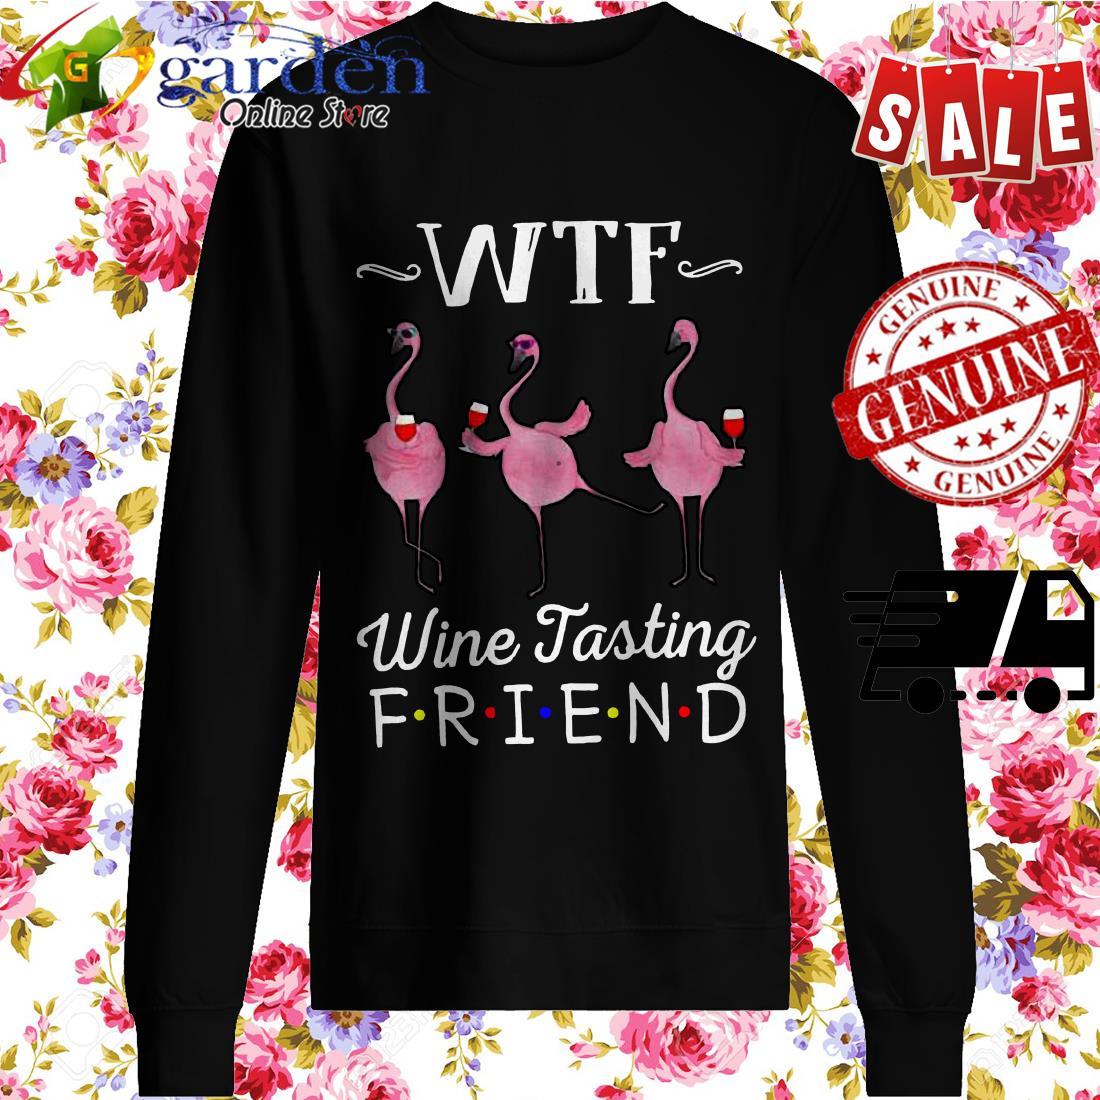 WTF wine tasting friends Flamingo sweater